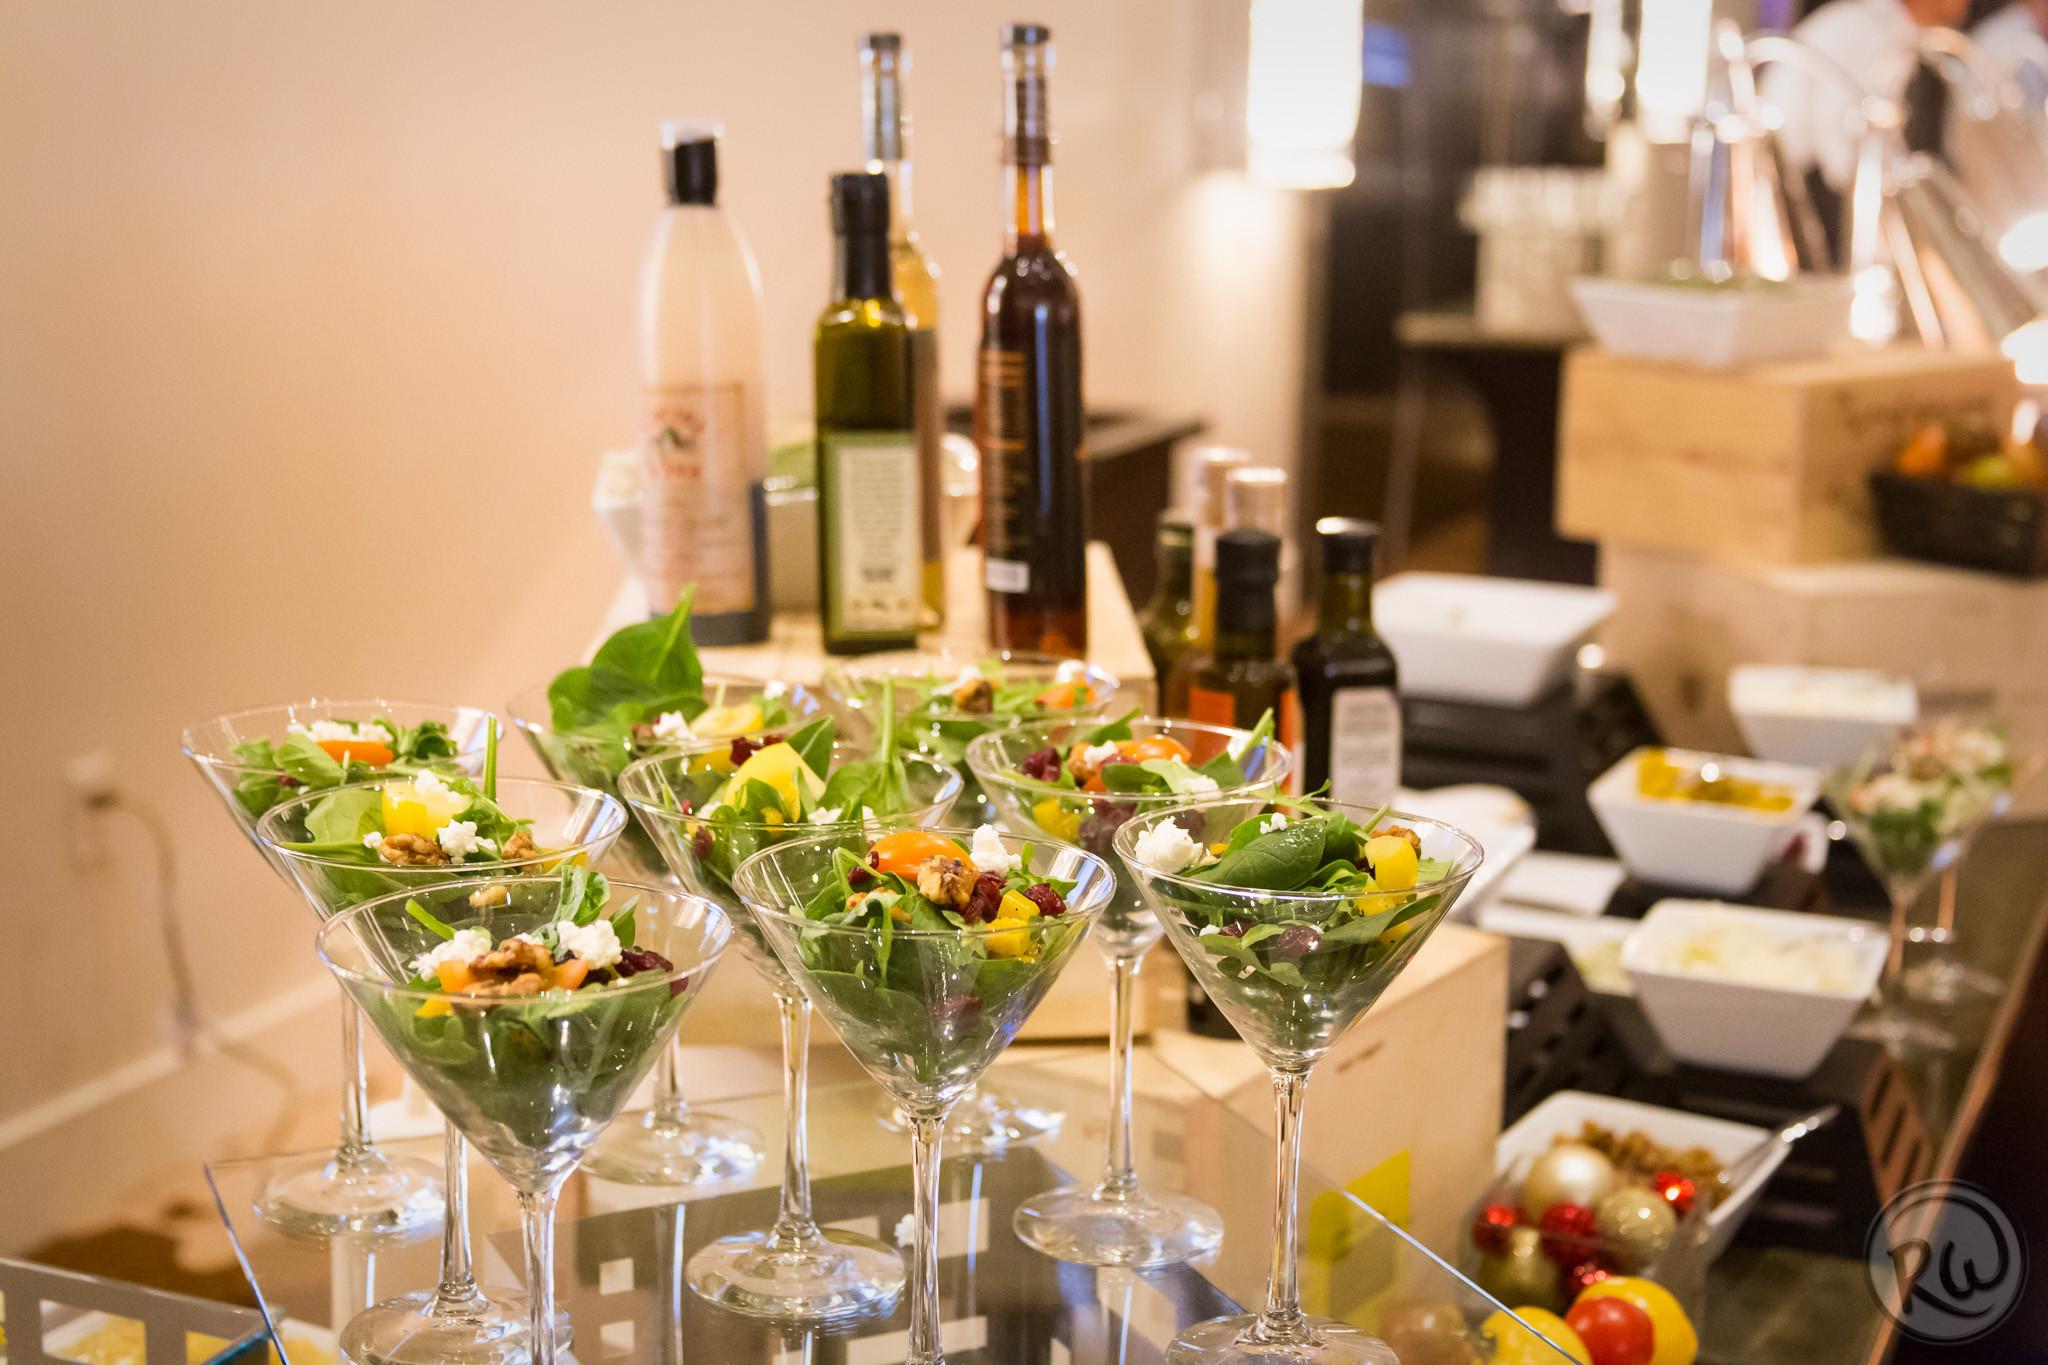 Dinner Receptions or Galas